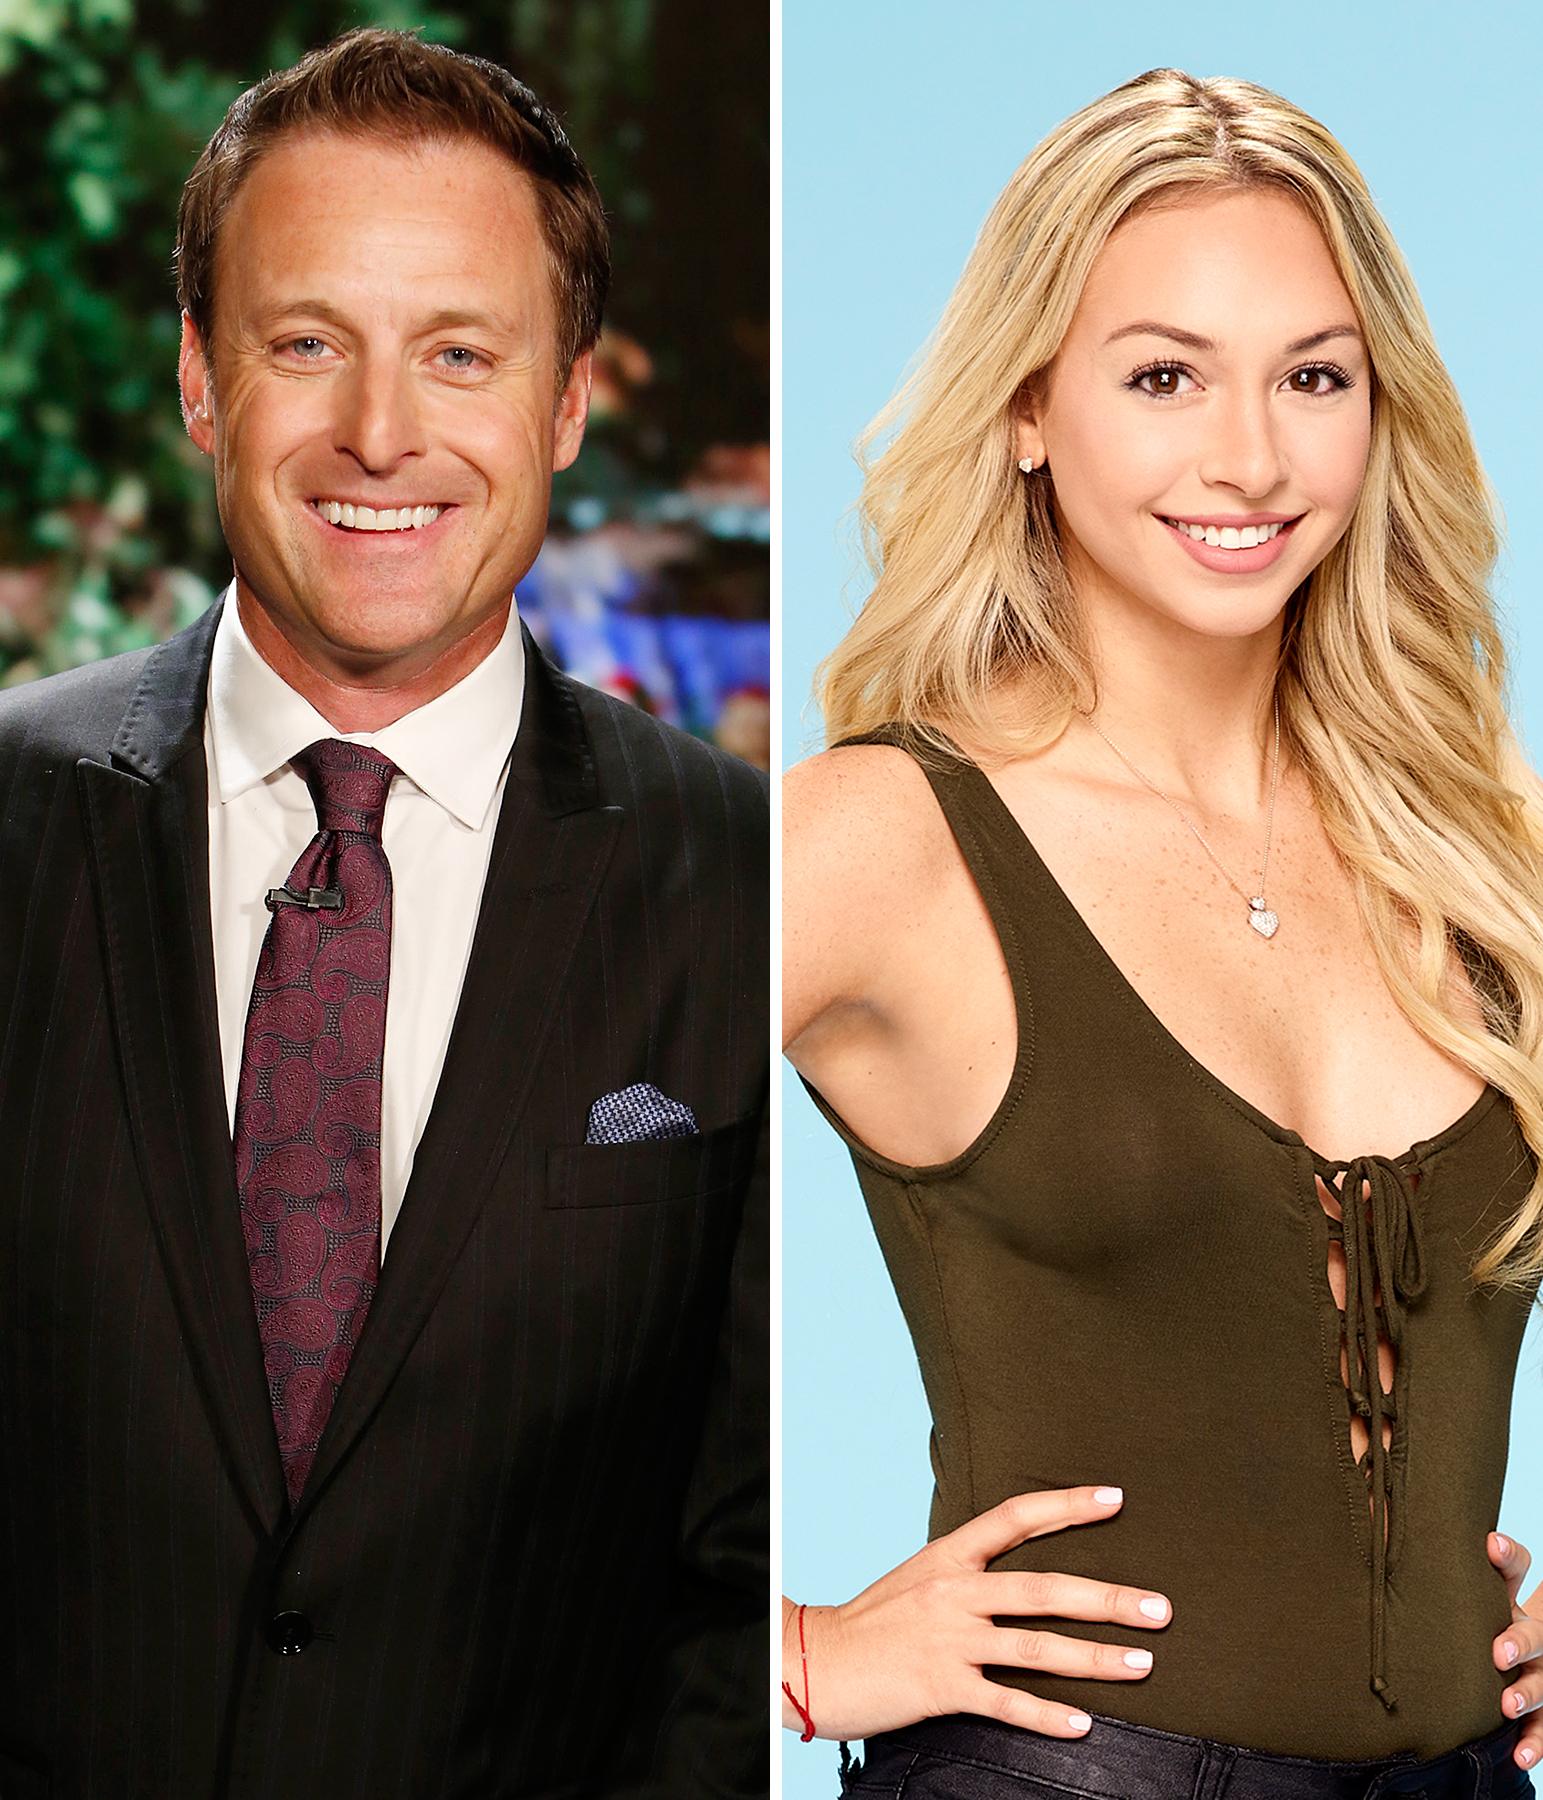 Chris Harrison Praises Bachelors Corinne Doing Very Well